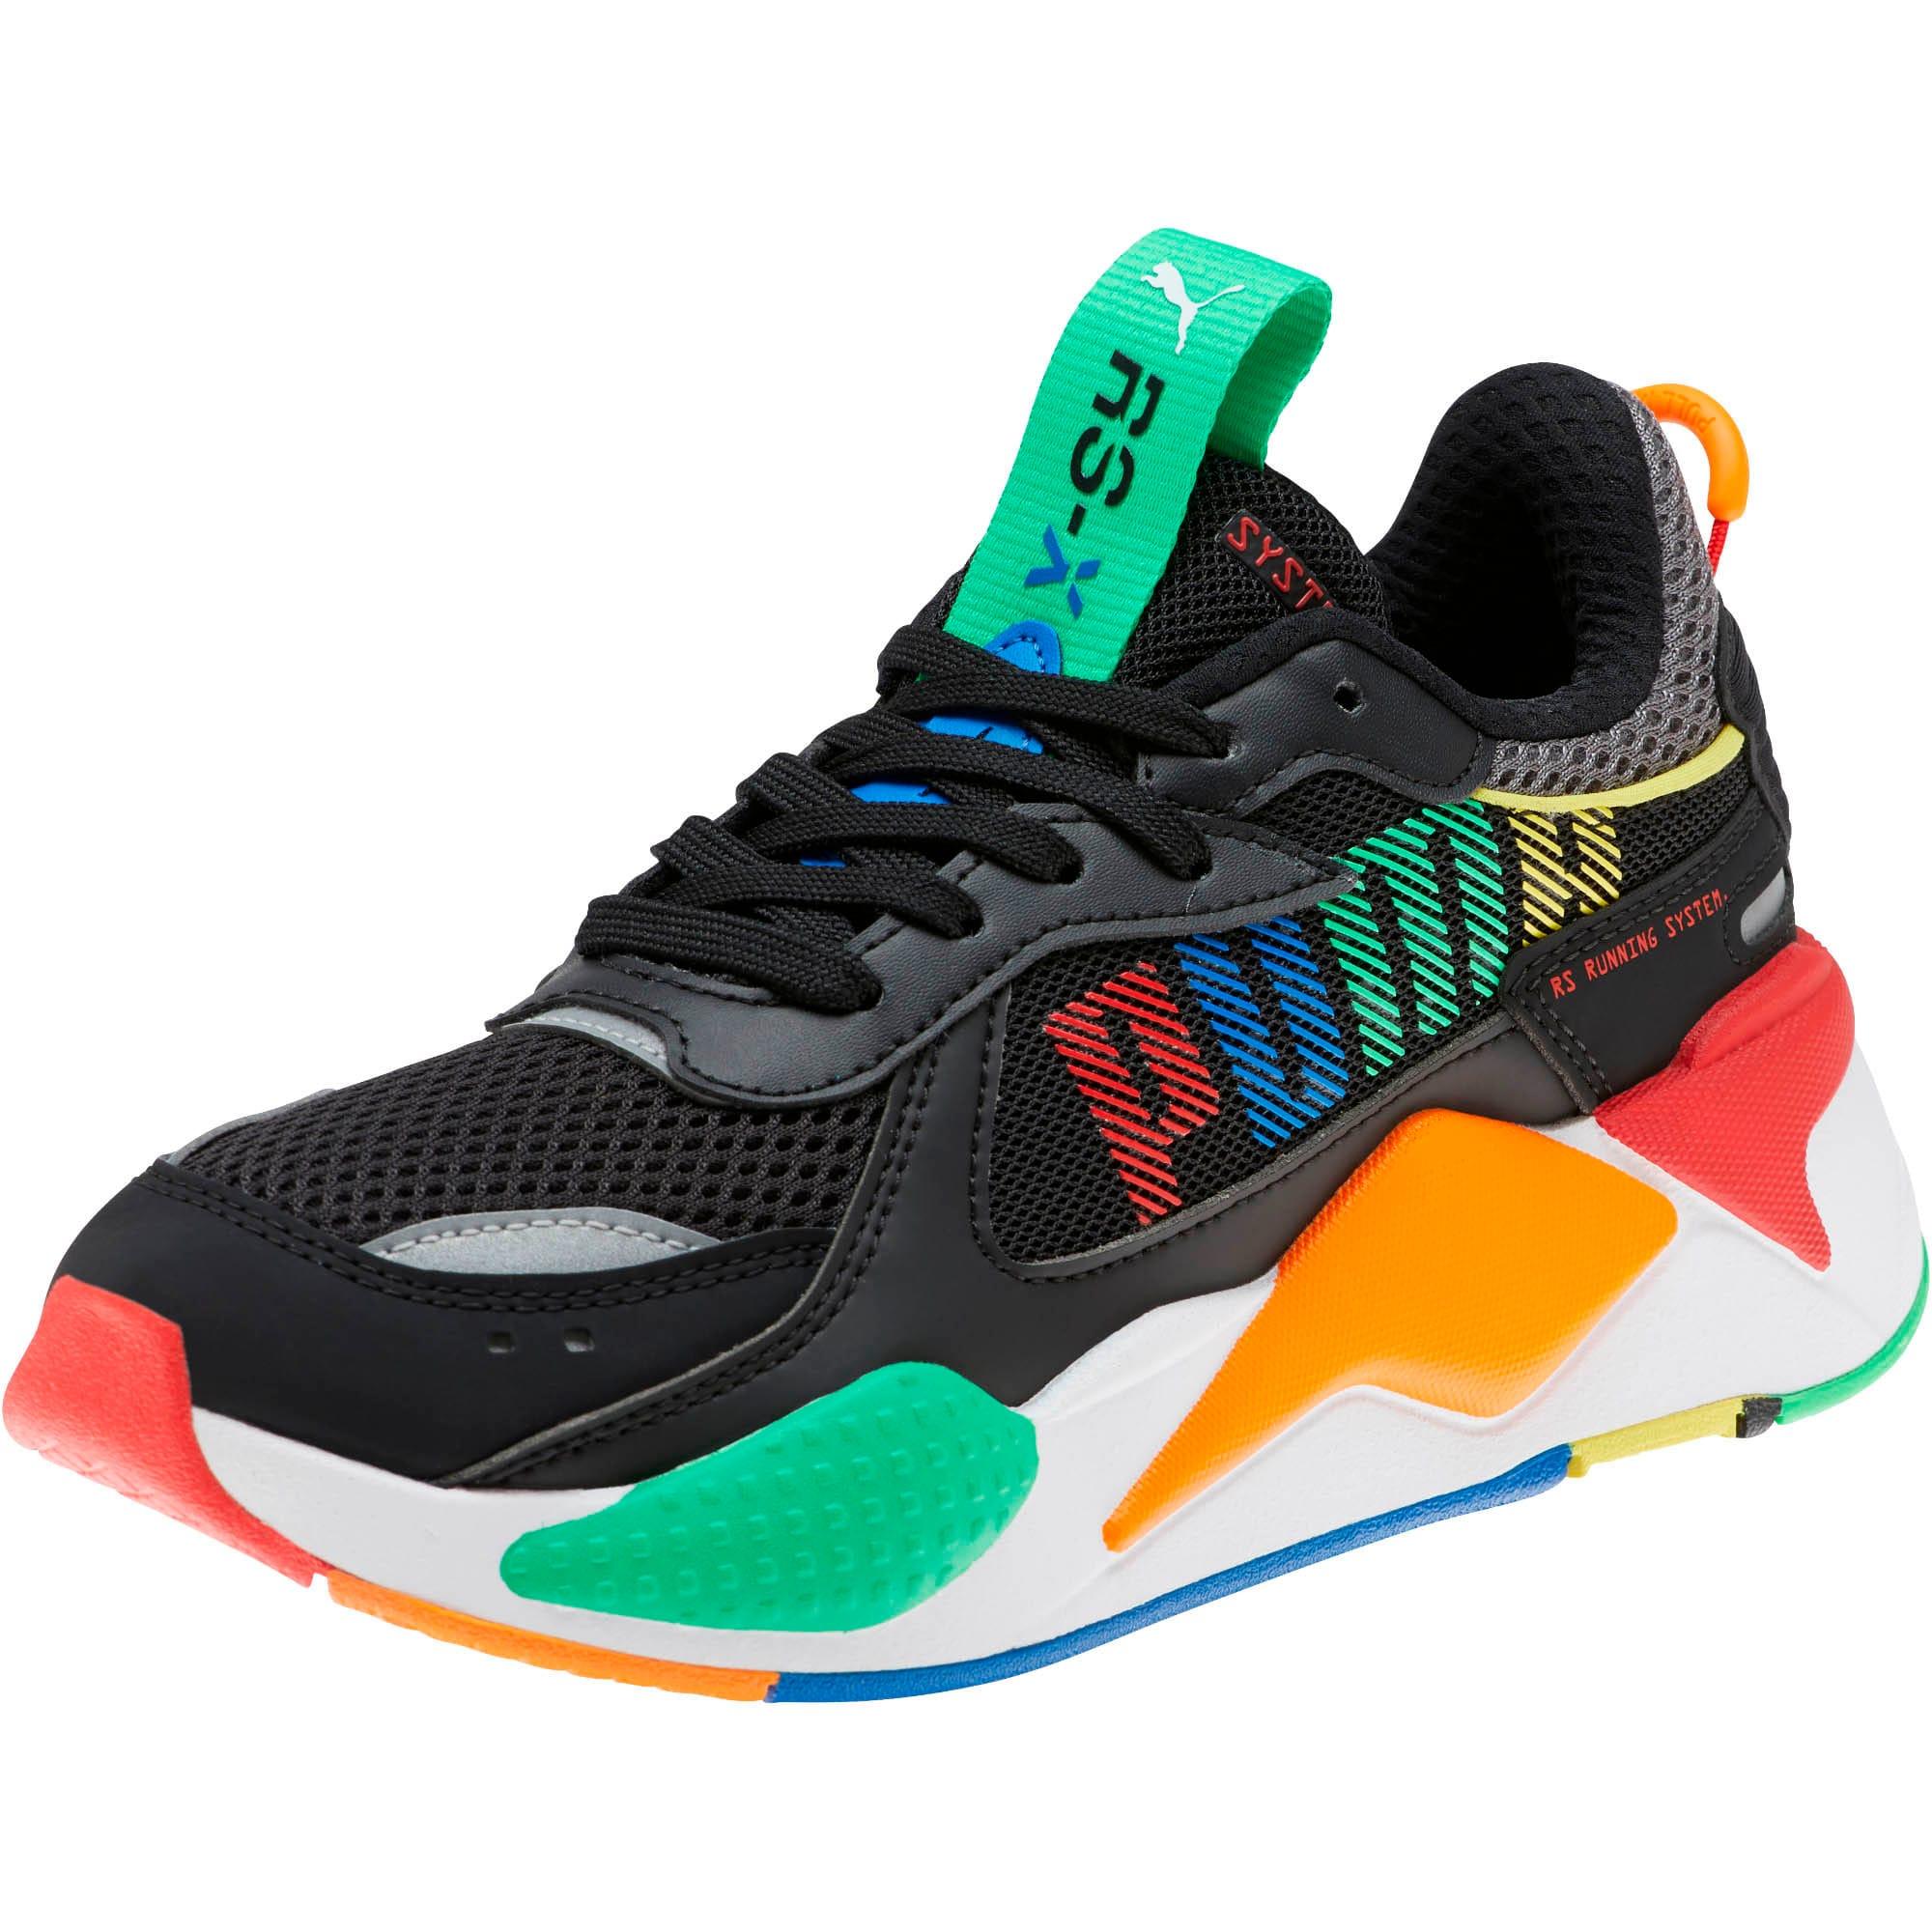 Thumbnail 1 of RS-X Bold Sneakers JR, P Black-ANDEAN TOUCAN-Orange, medium